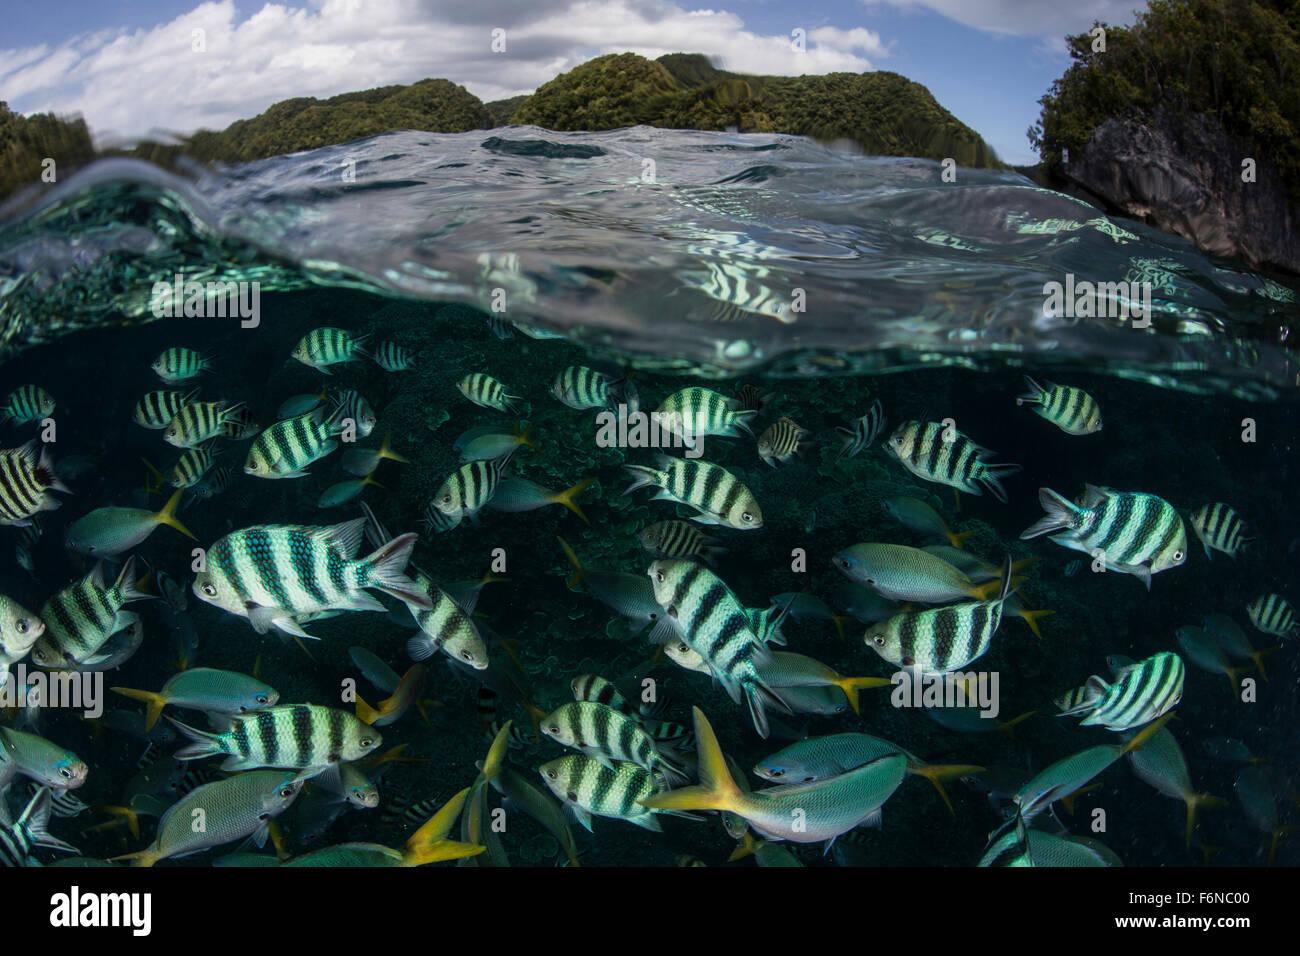 School of large damselfish in Palau's inner lagoon. This Micronesian destination is popular among scuba divers - Stock Image